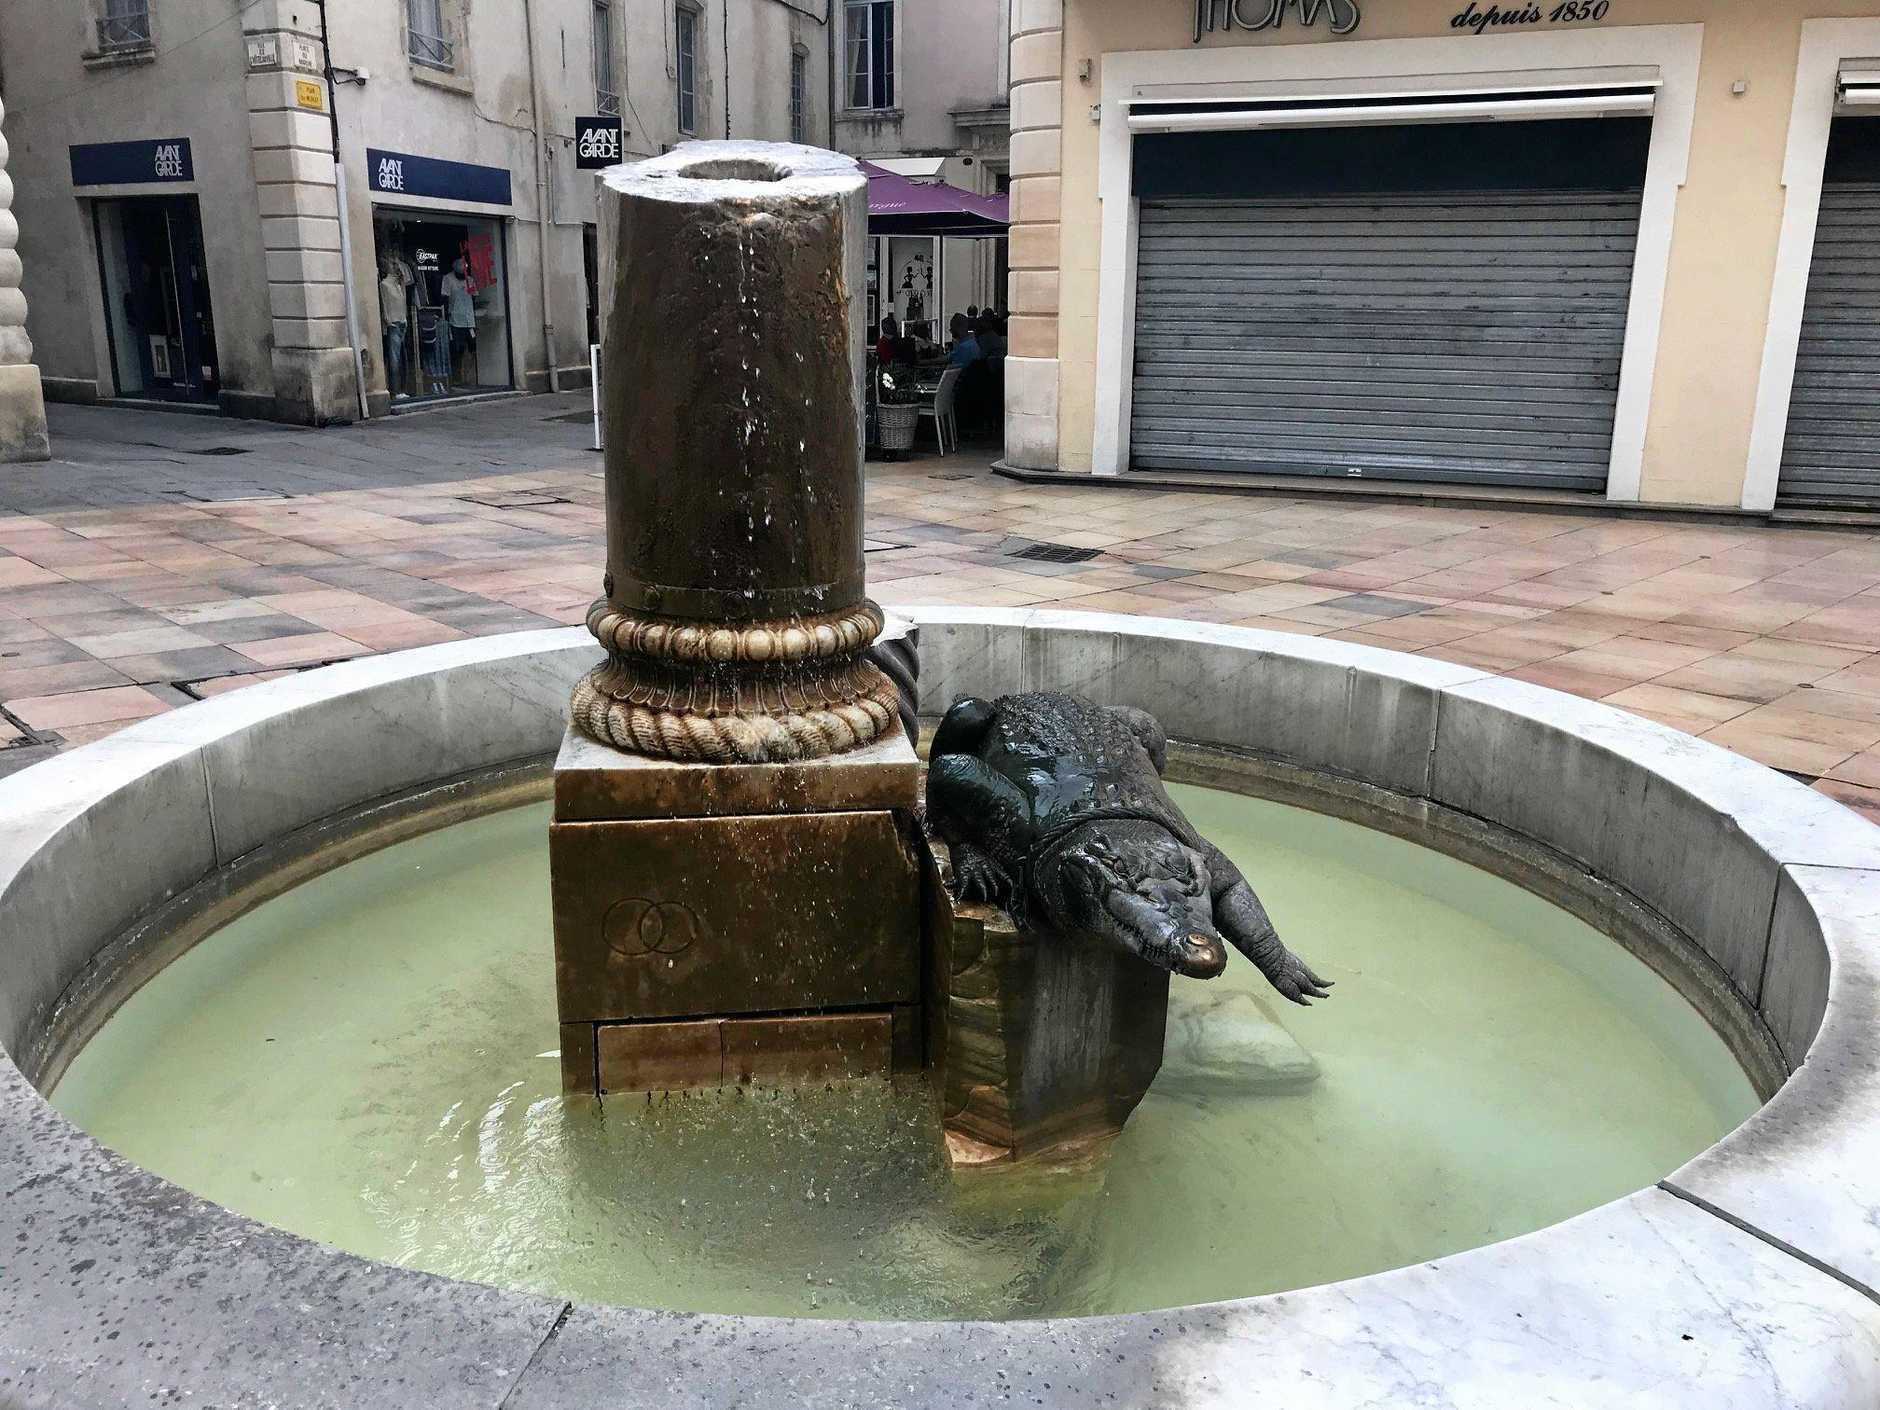 A crocodile sculpture, Nimes.